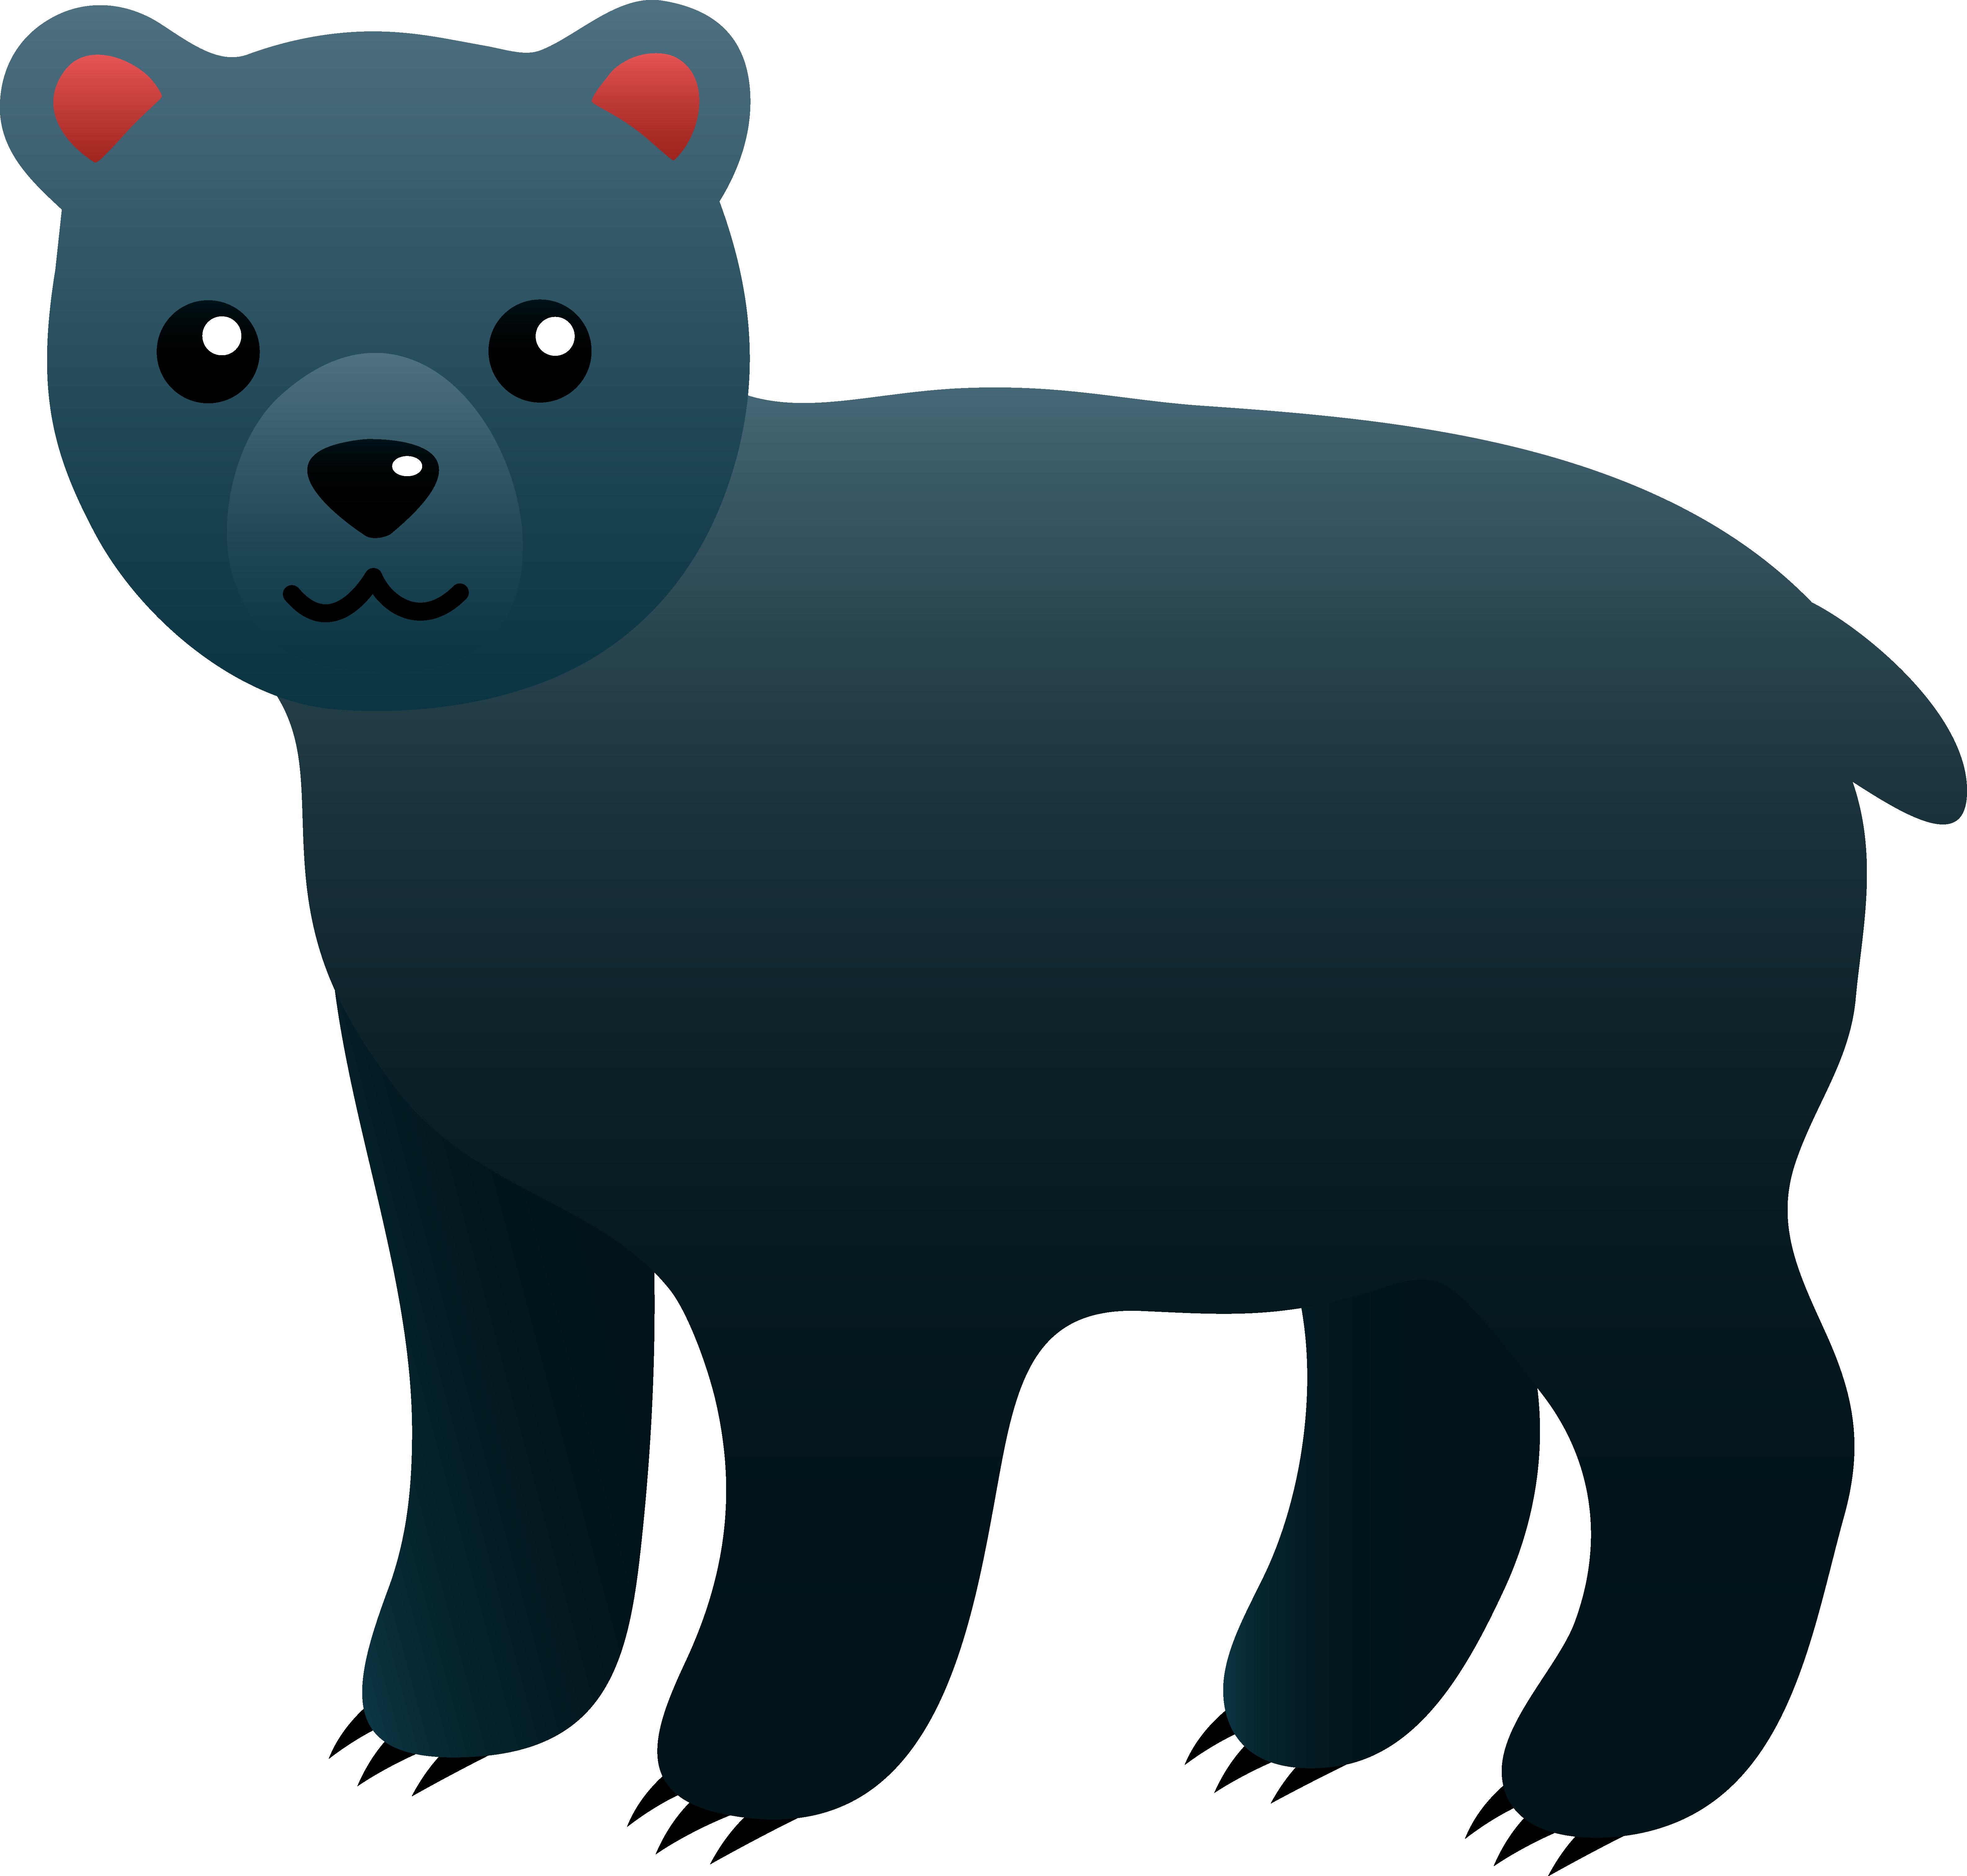 American black bear clipart jpg free stock Cute Black Bear - Free Clip Art jpg free stock